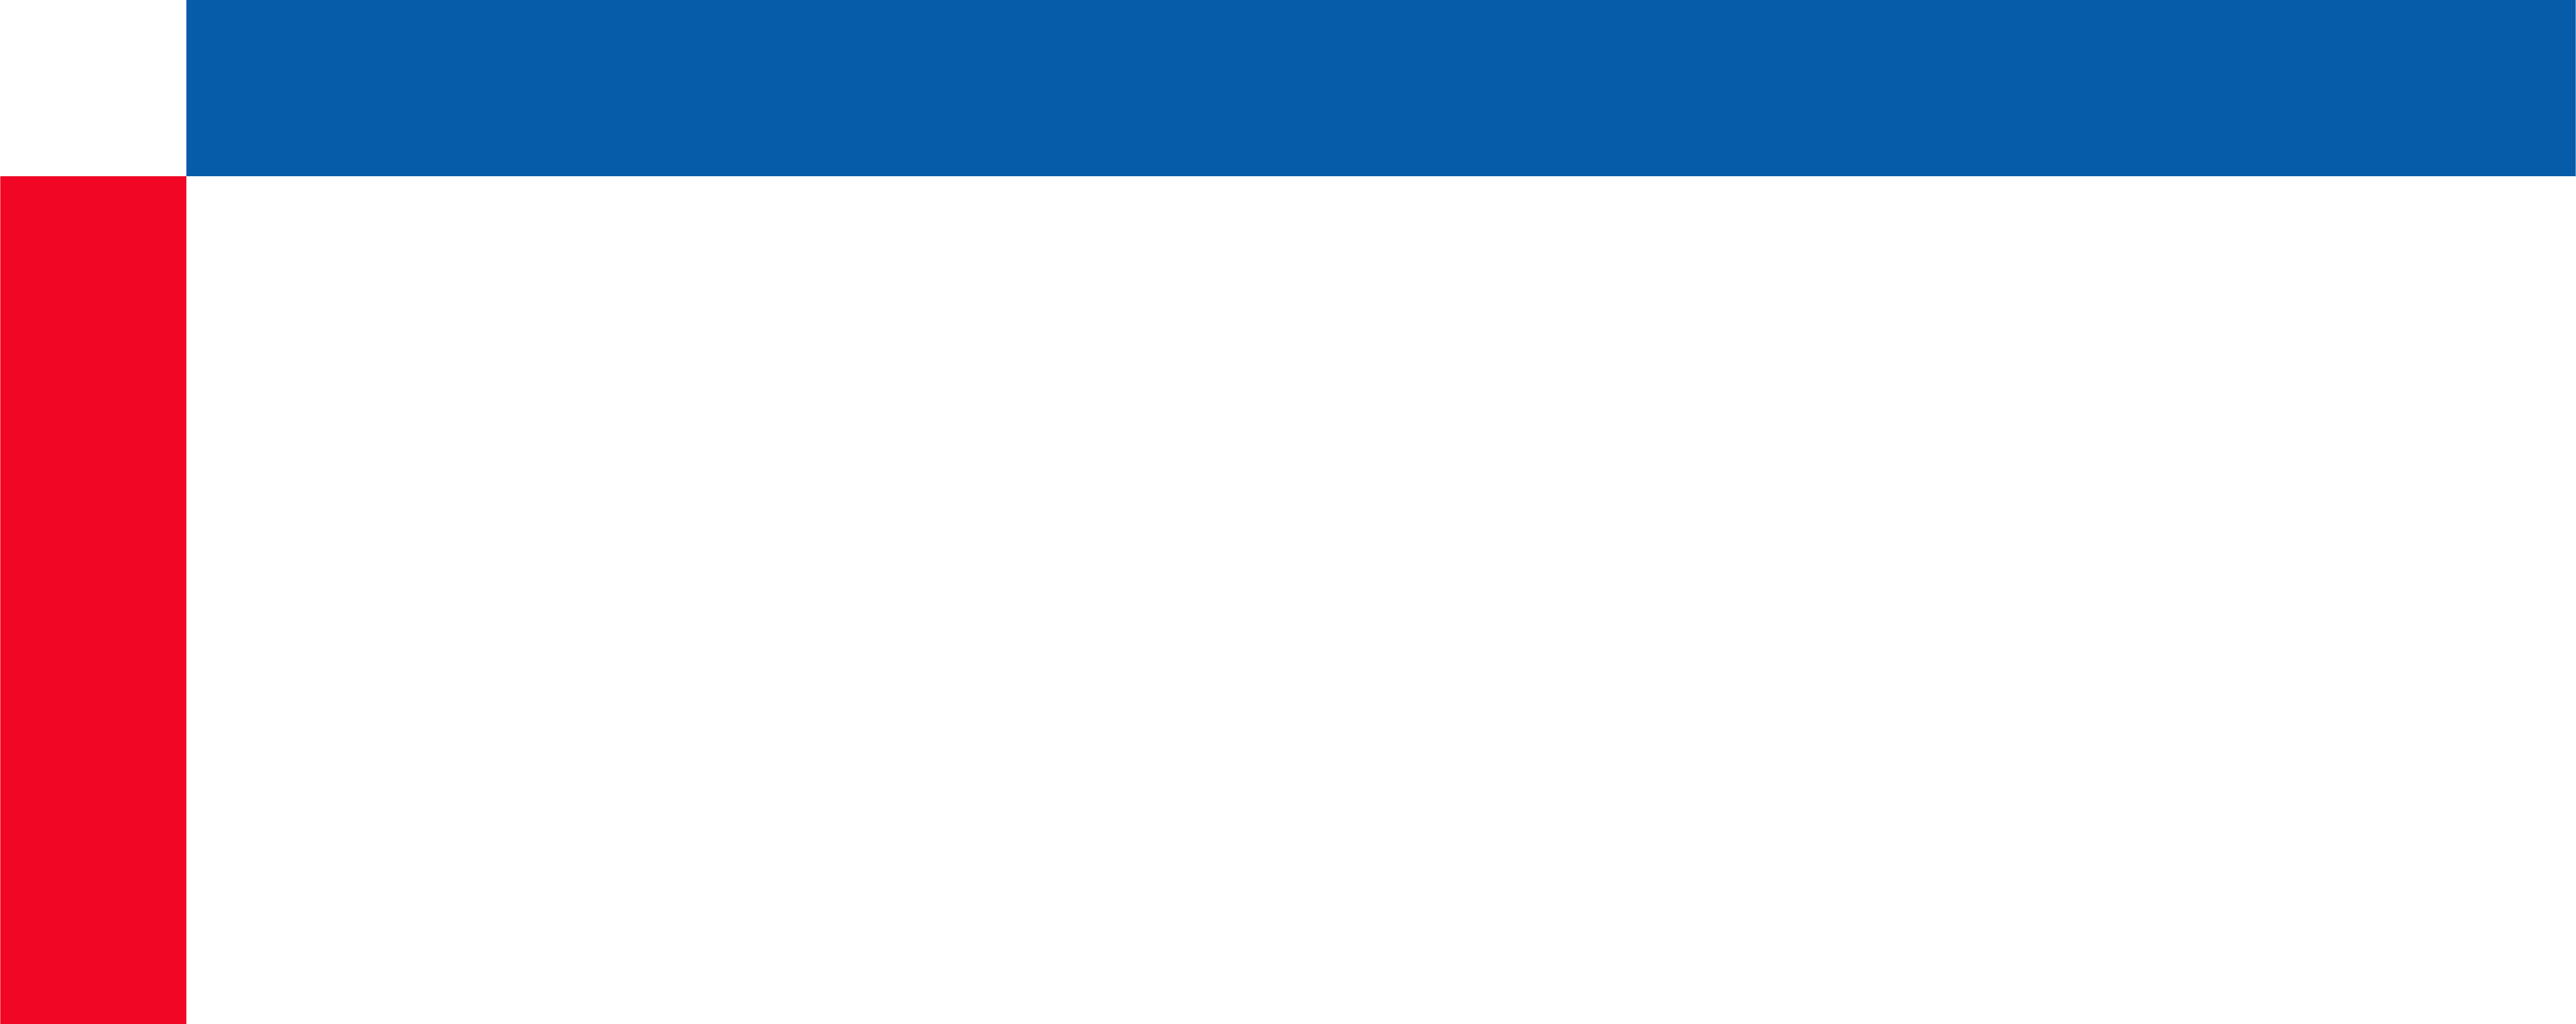 szr MONTING – Dane Dvizac